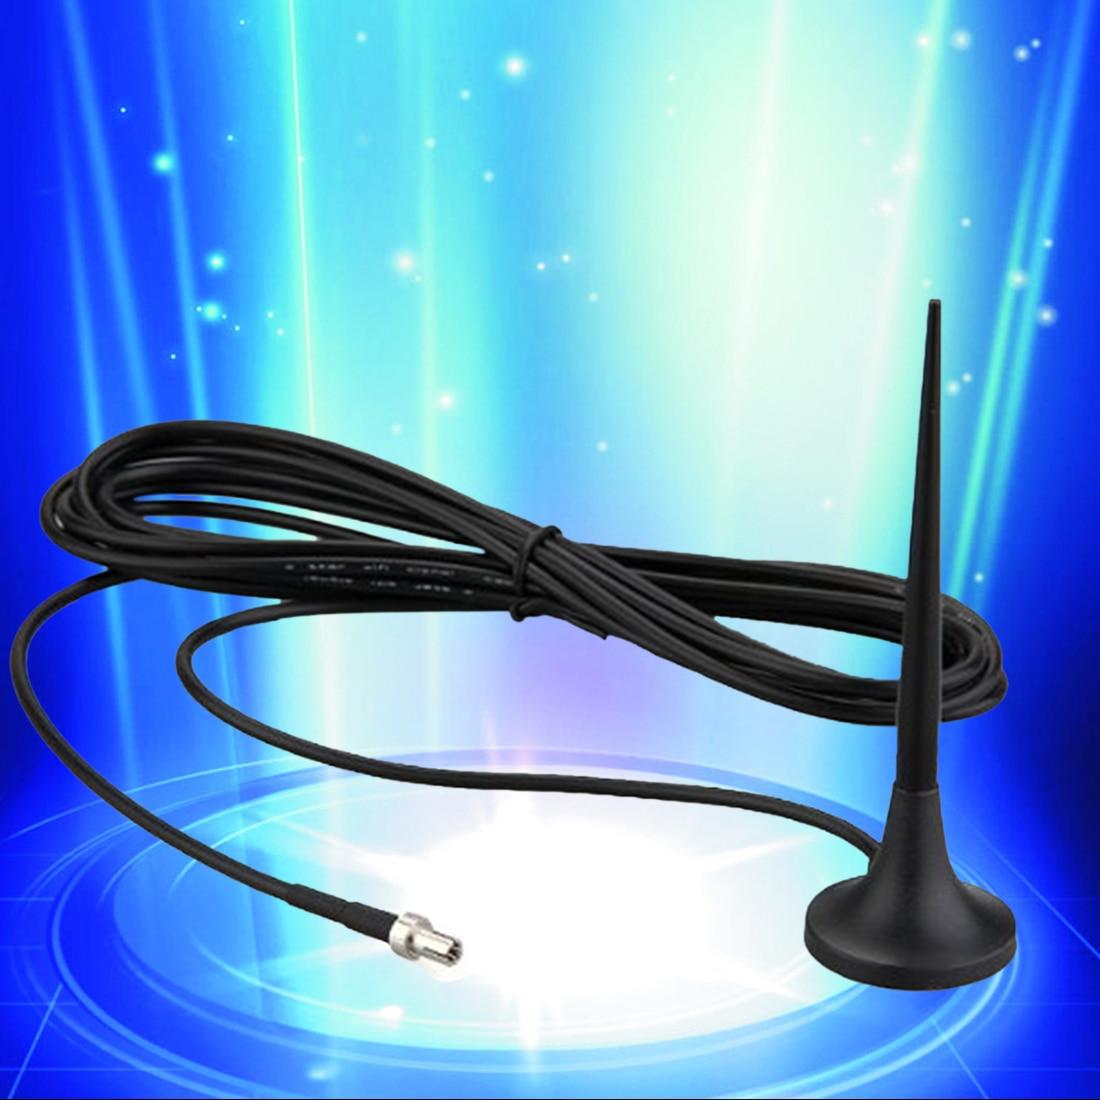 Aliexpress.com : Buy Etmakit Hot Sale 3G/Gsm/Umts USB